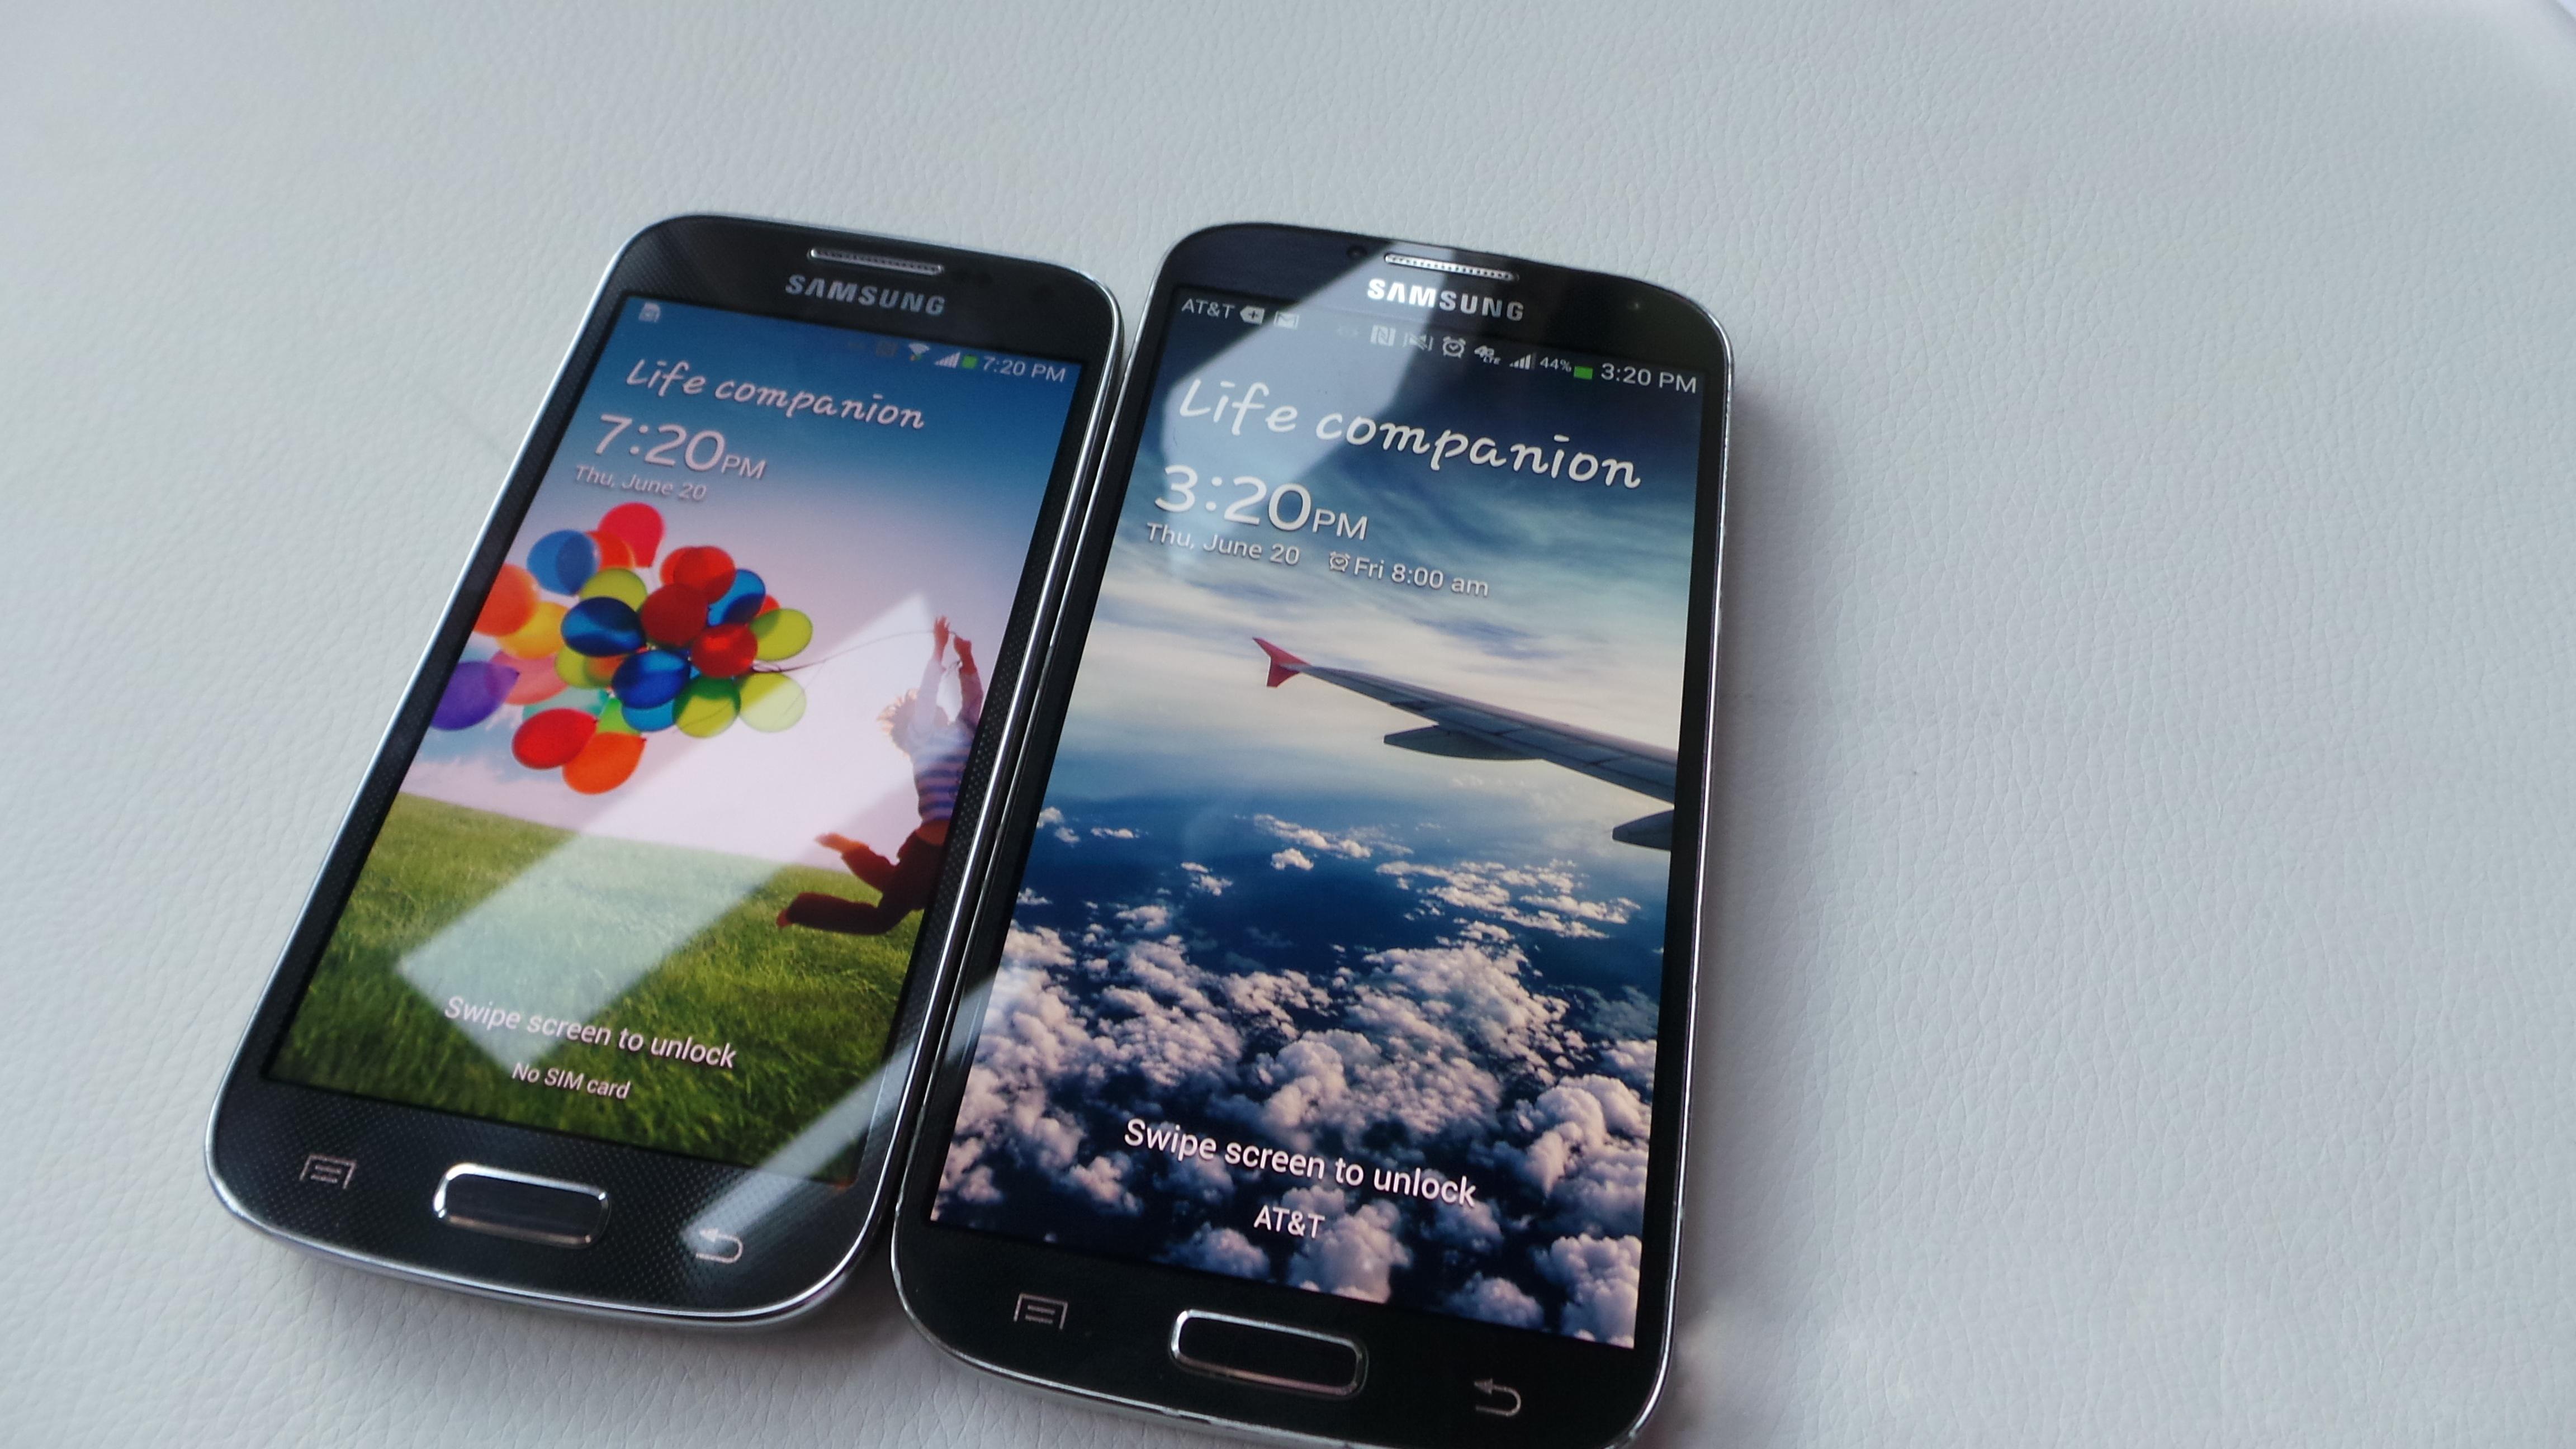 Amazoncom Samsung Galaxy S III 16GB SPHL710 Marble